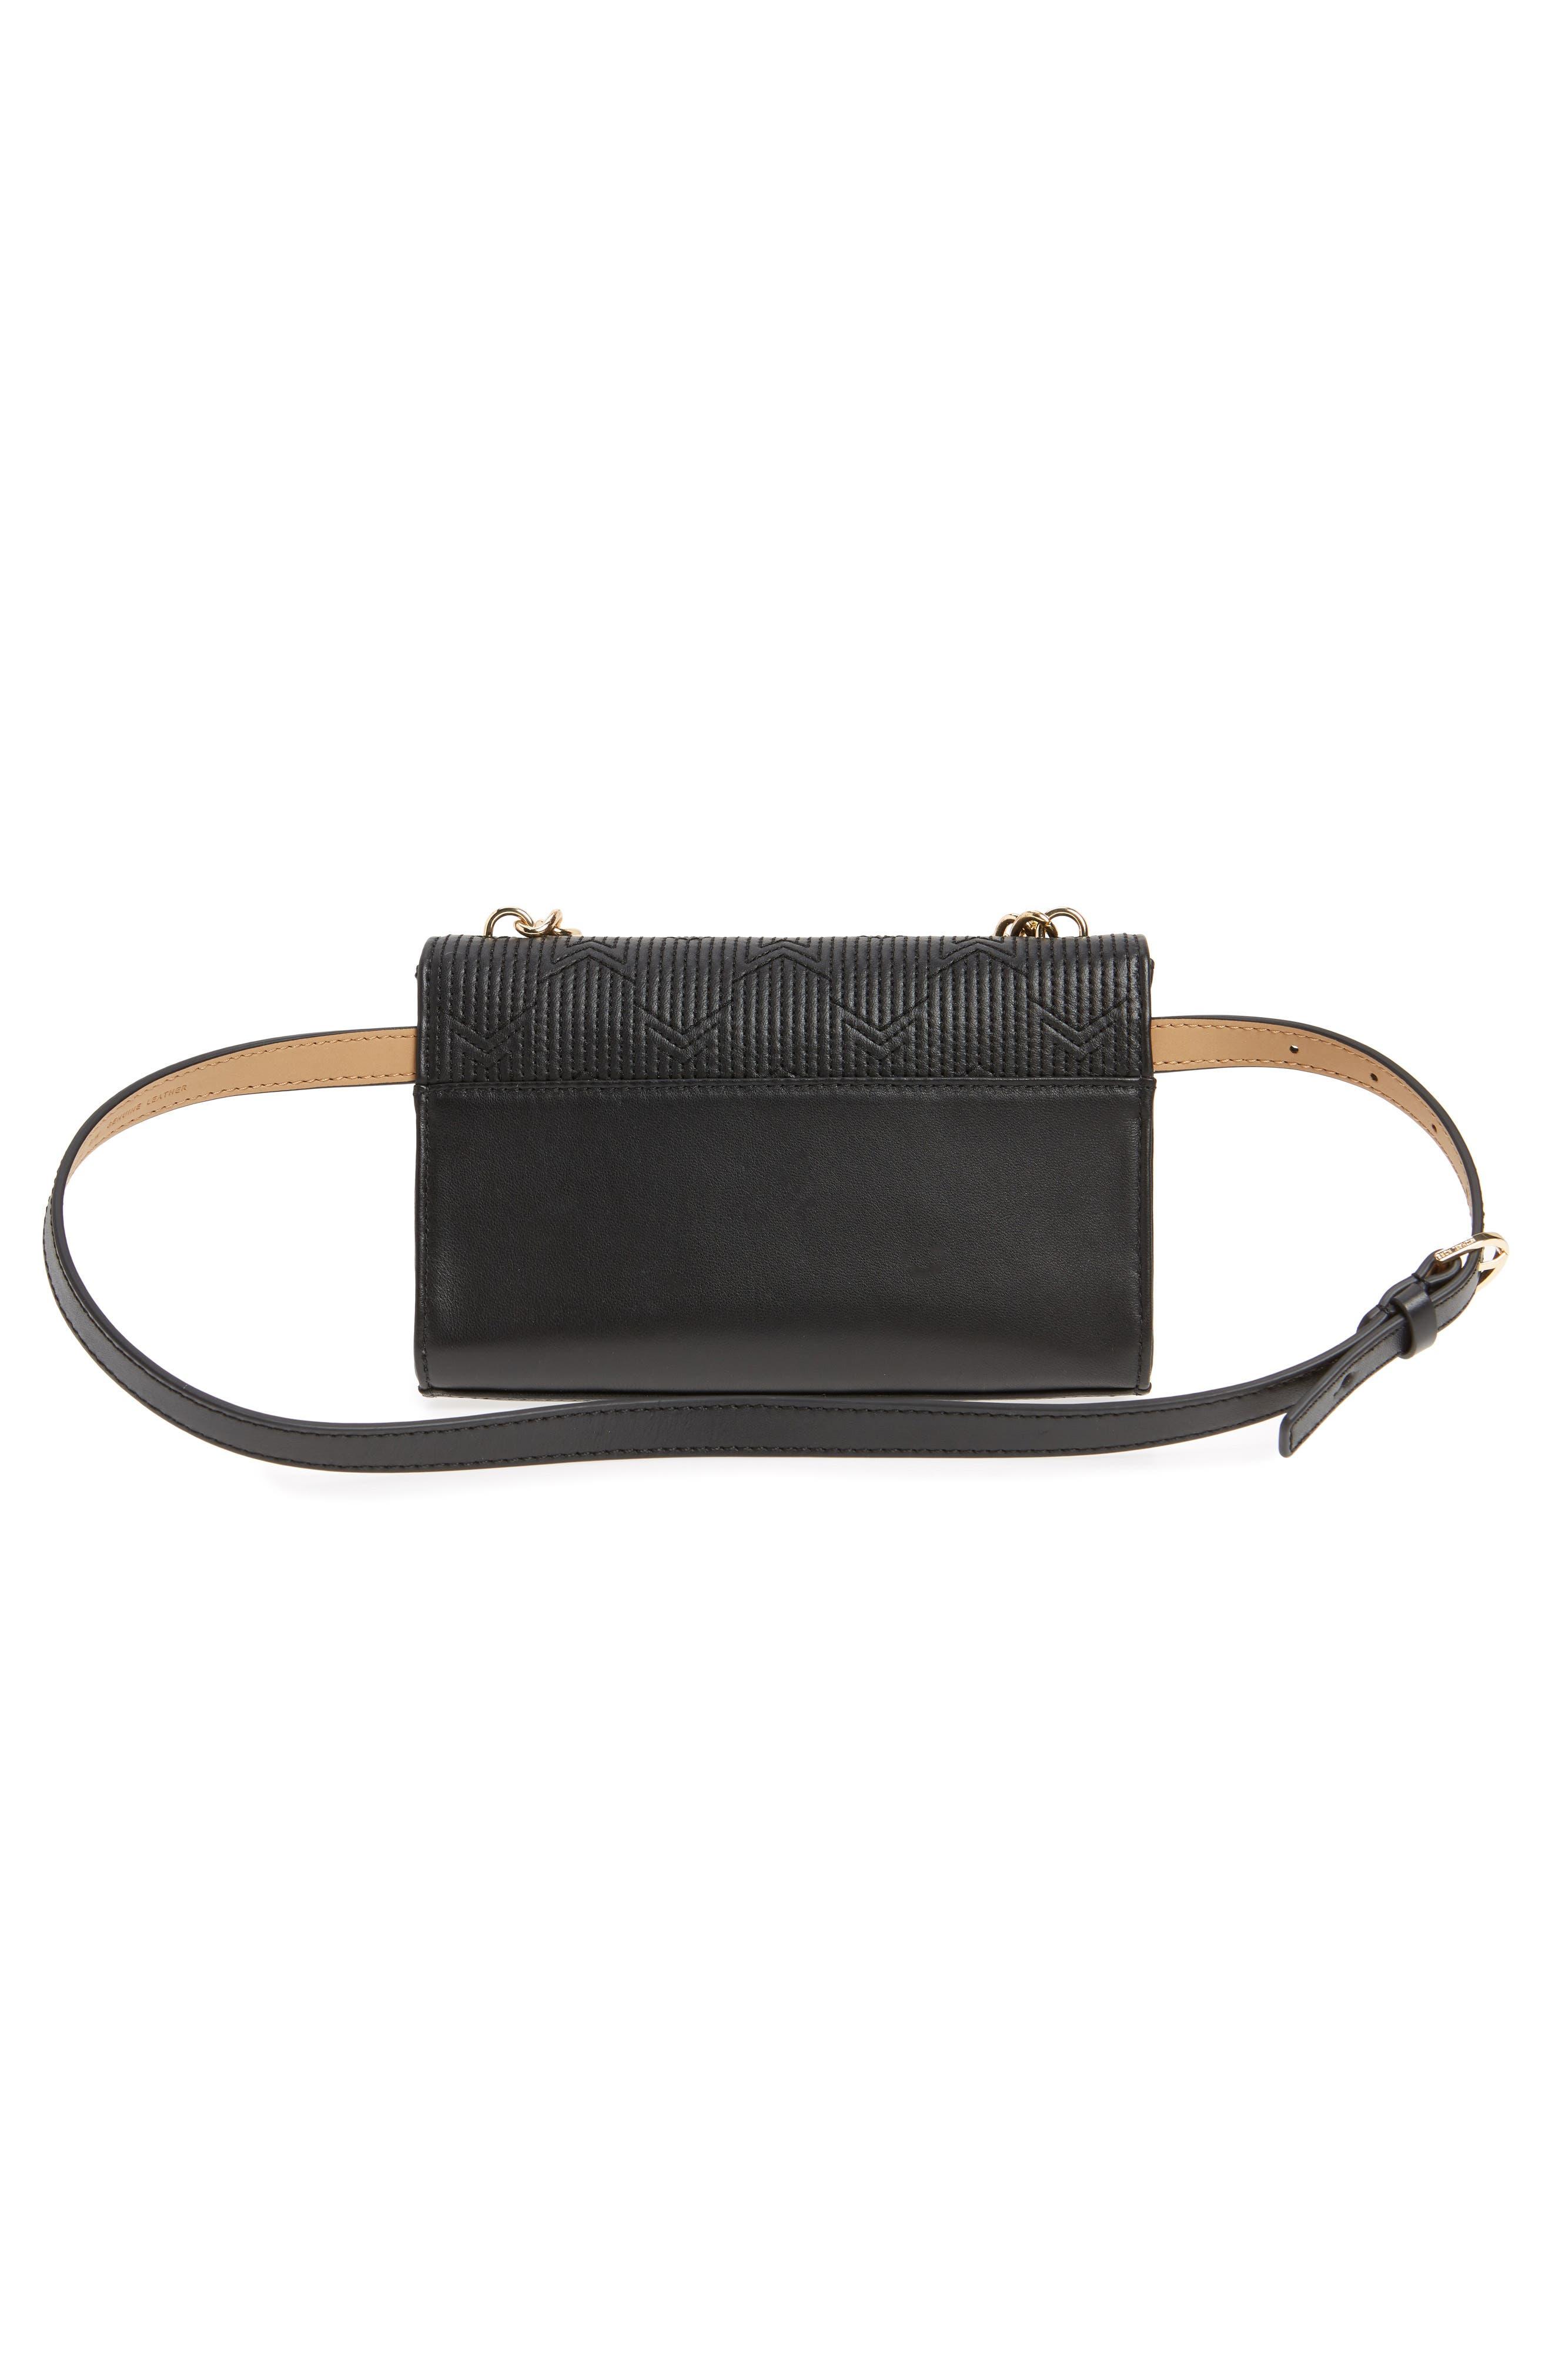 Deco M Quilted Leather Belt Bag,                             Alternate thumbnail 4, color,                             BLACK